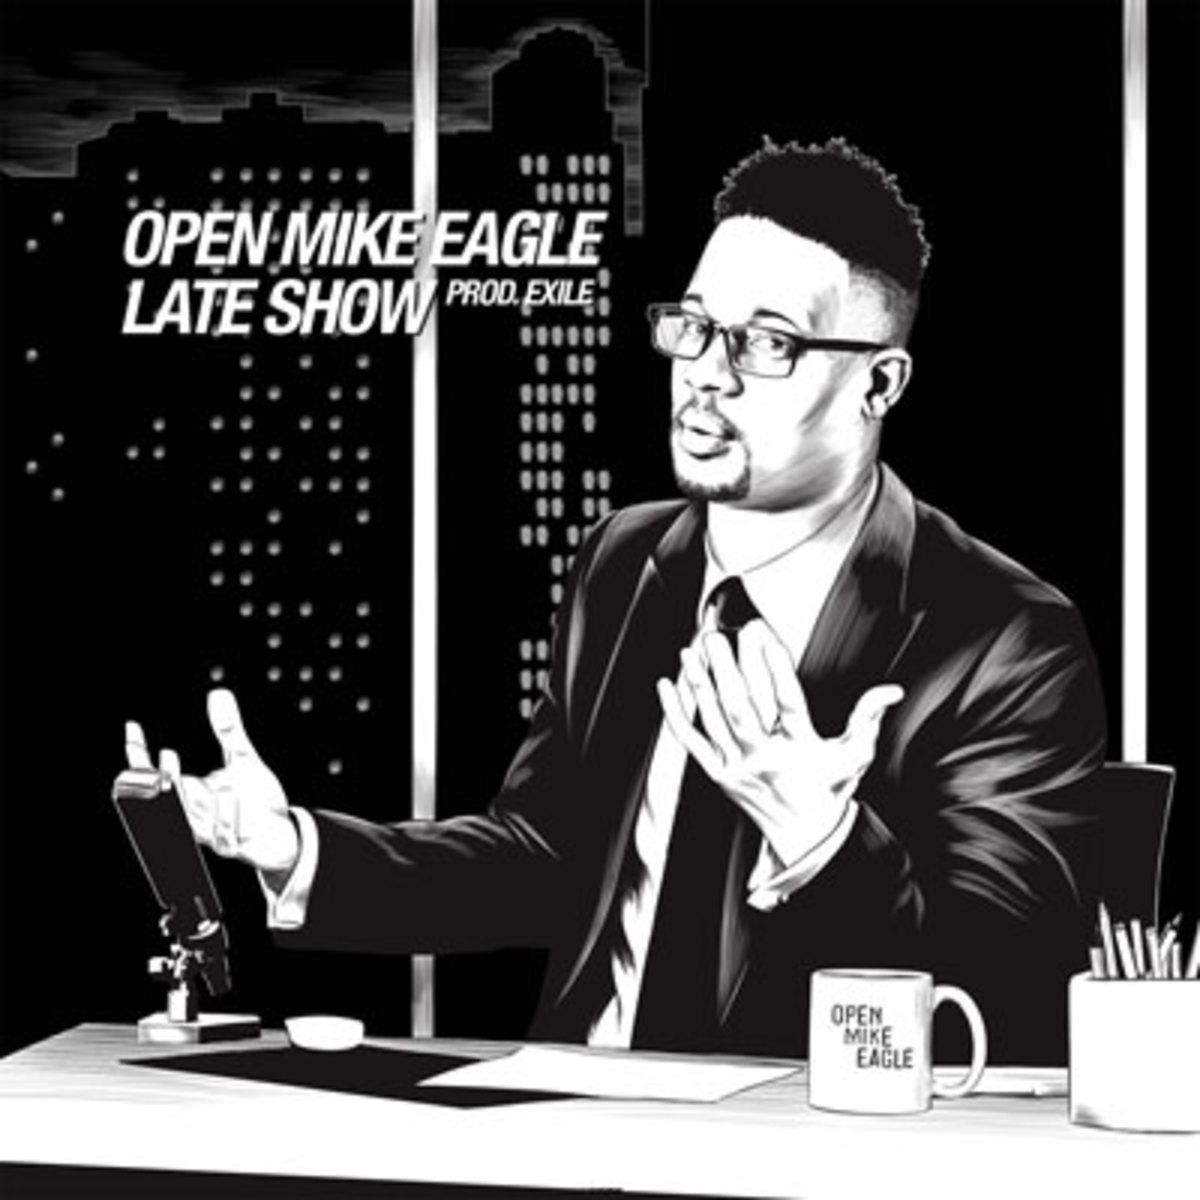 openmikeeagle-lateshow.jpg